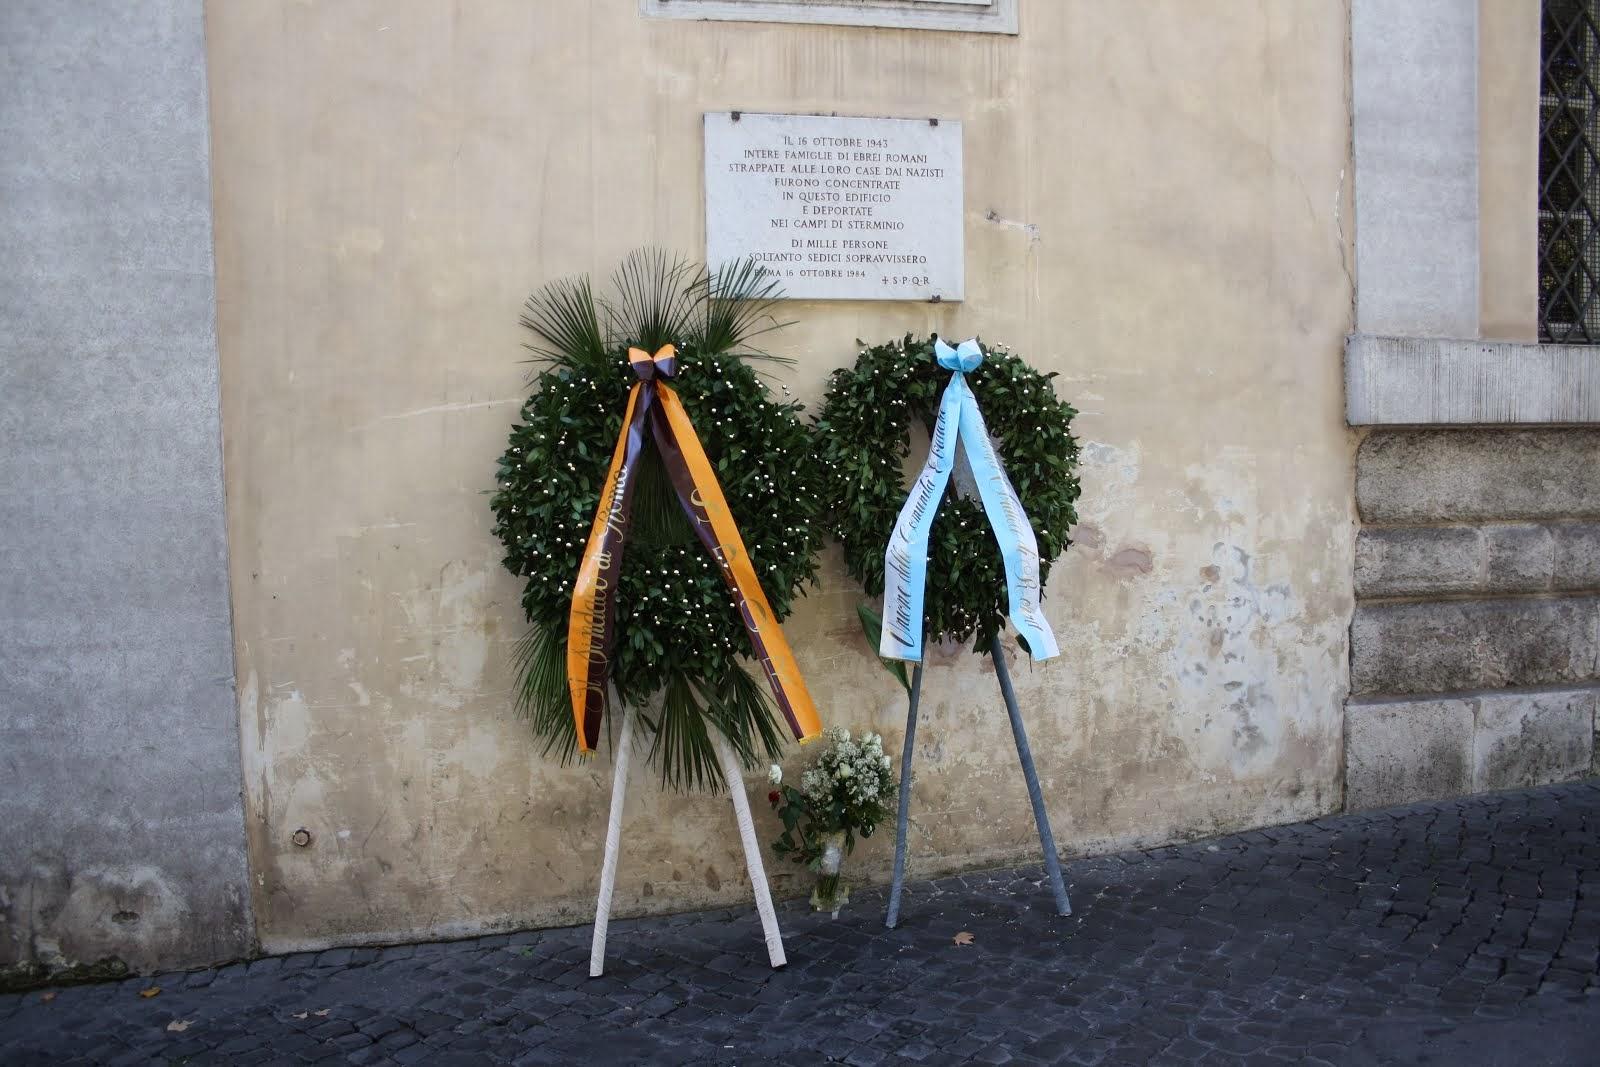 Roma 16 ottobre 2013